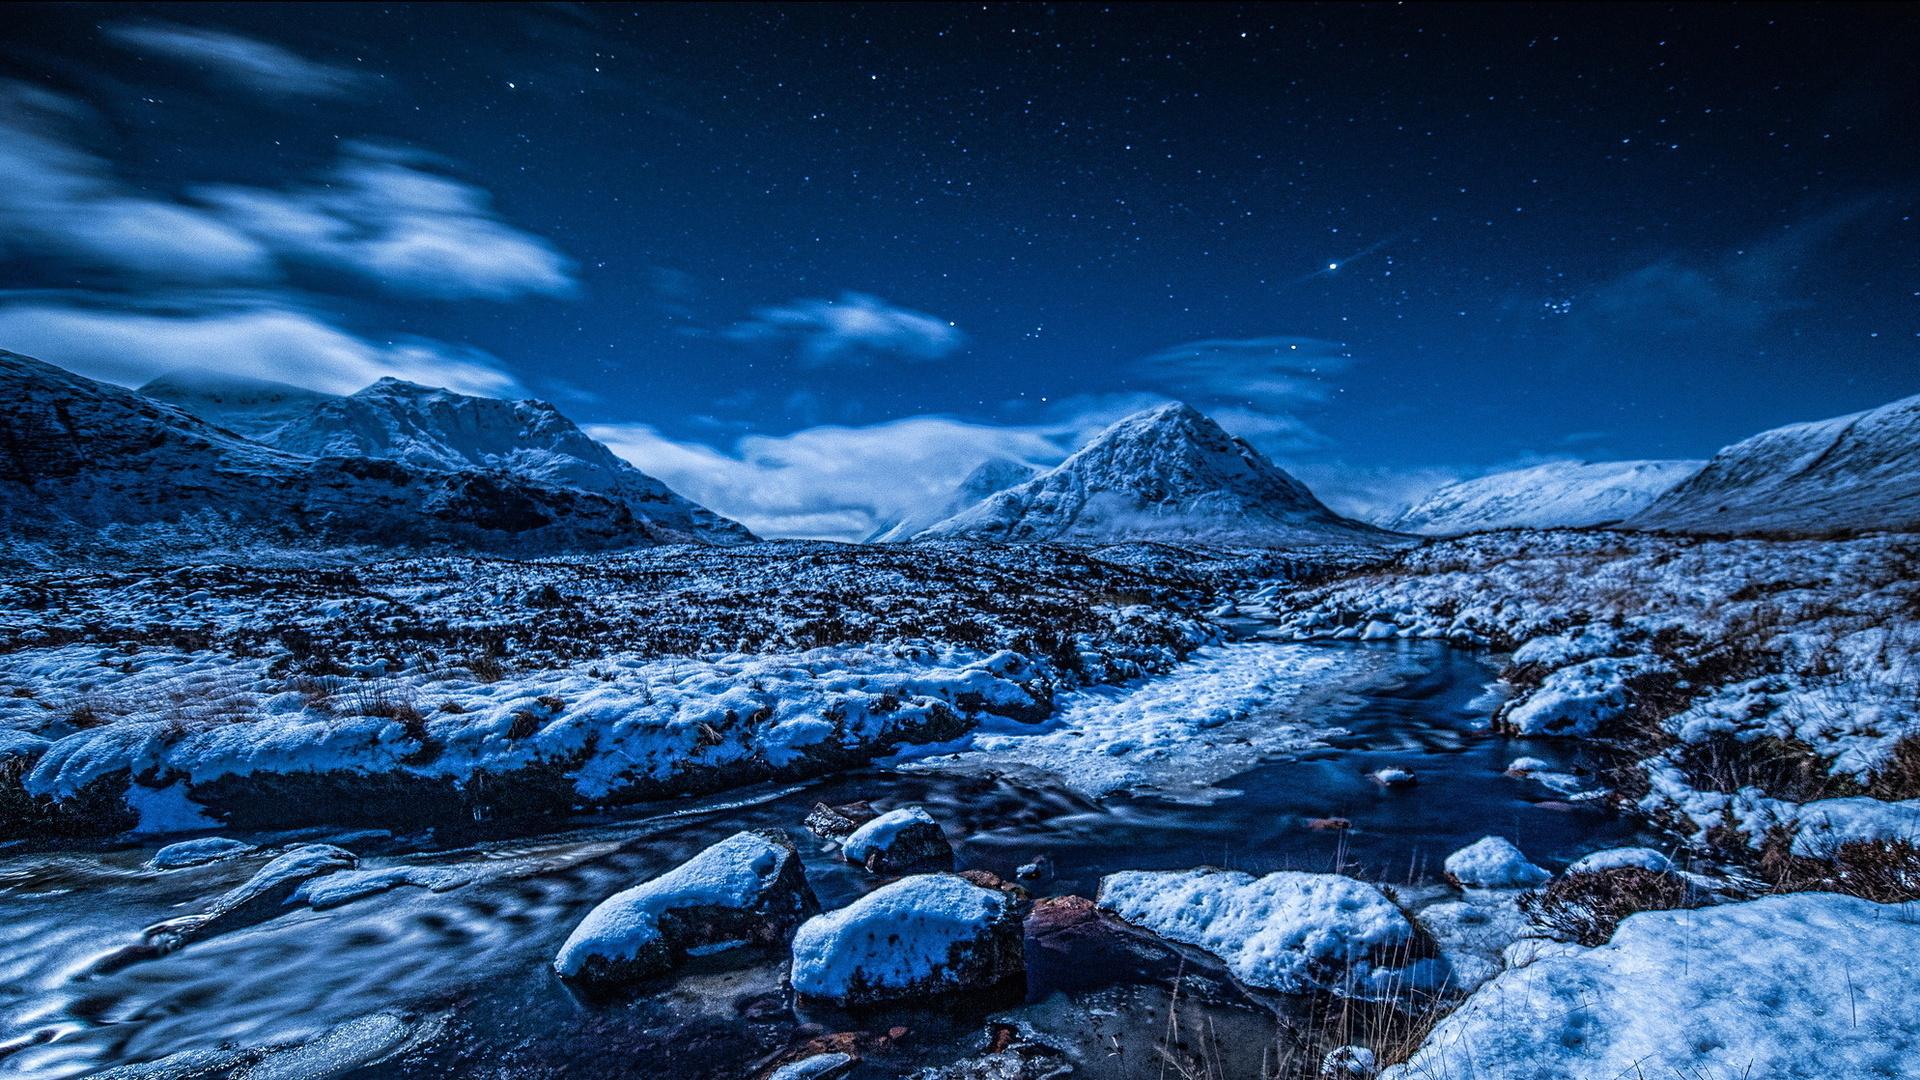 Night sky stars mountains stream snow winter wallpaper ...